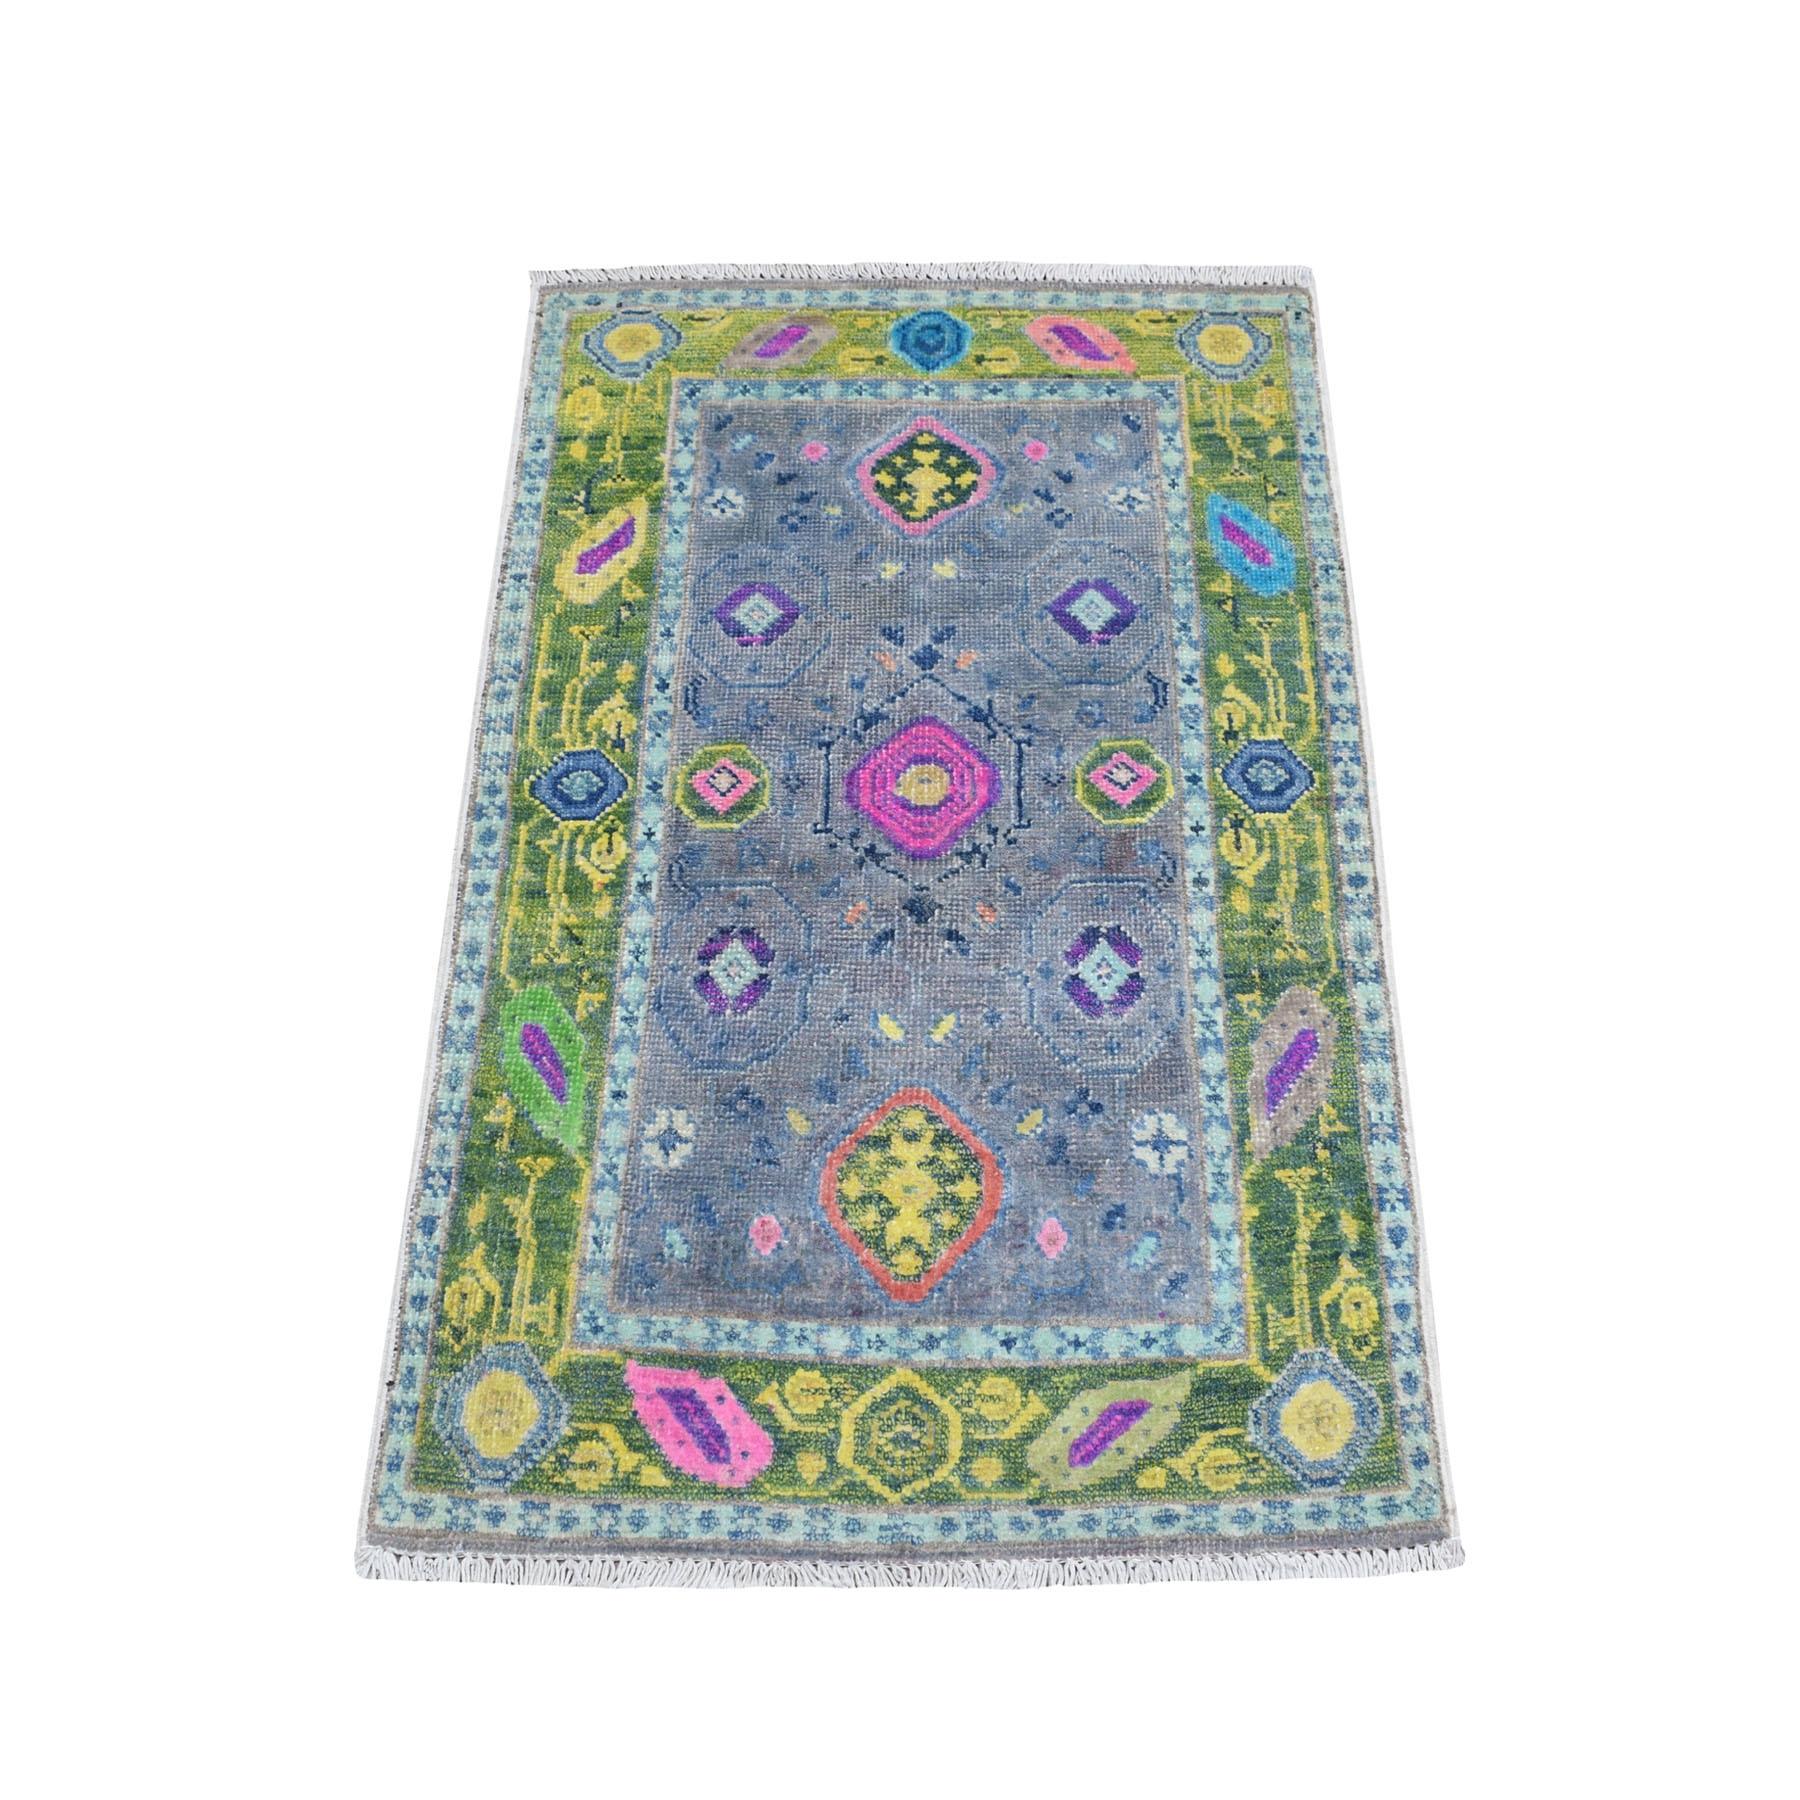 "2'X3'2"" Colorful Gray Fusion Kazak Pure Wool Geometric Design Hand Knotted Oriental Rug moaebc7e"